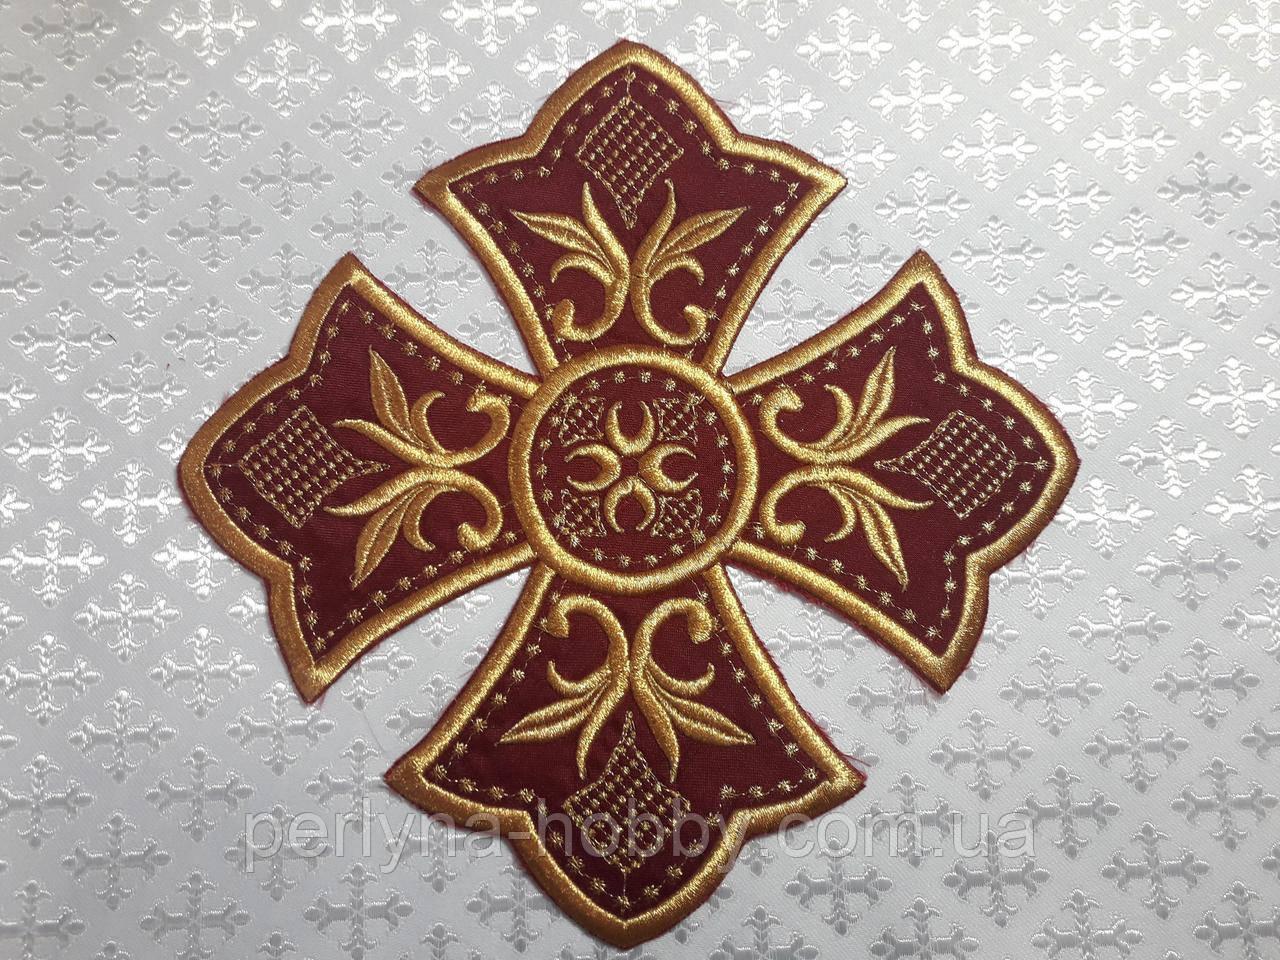 Хрест для церковного одягу великий 24 на 24 см бордовий з золотом